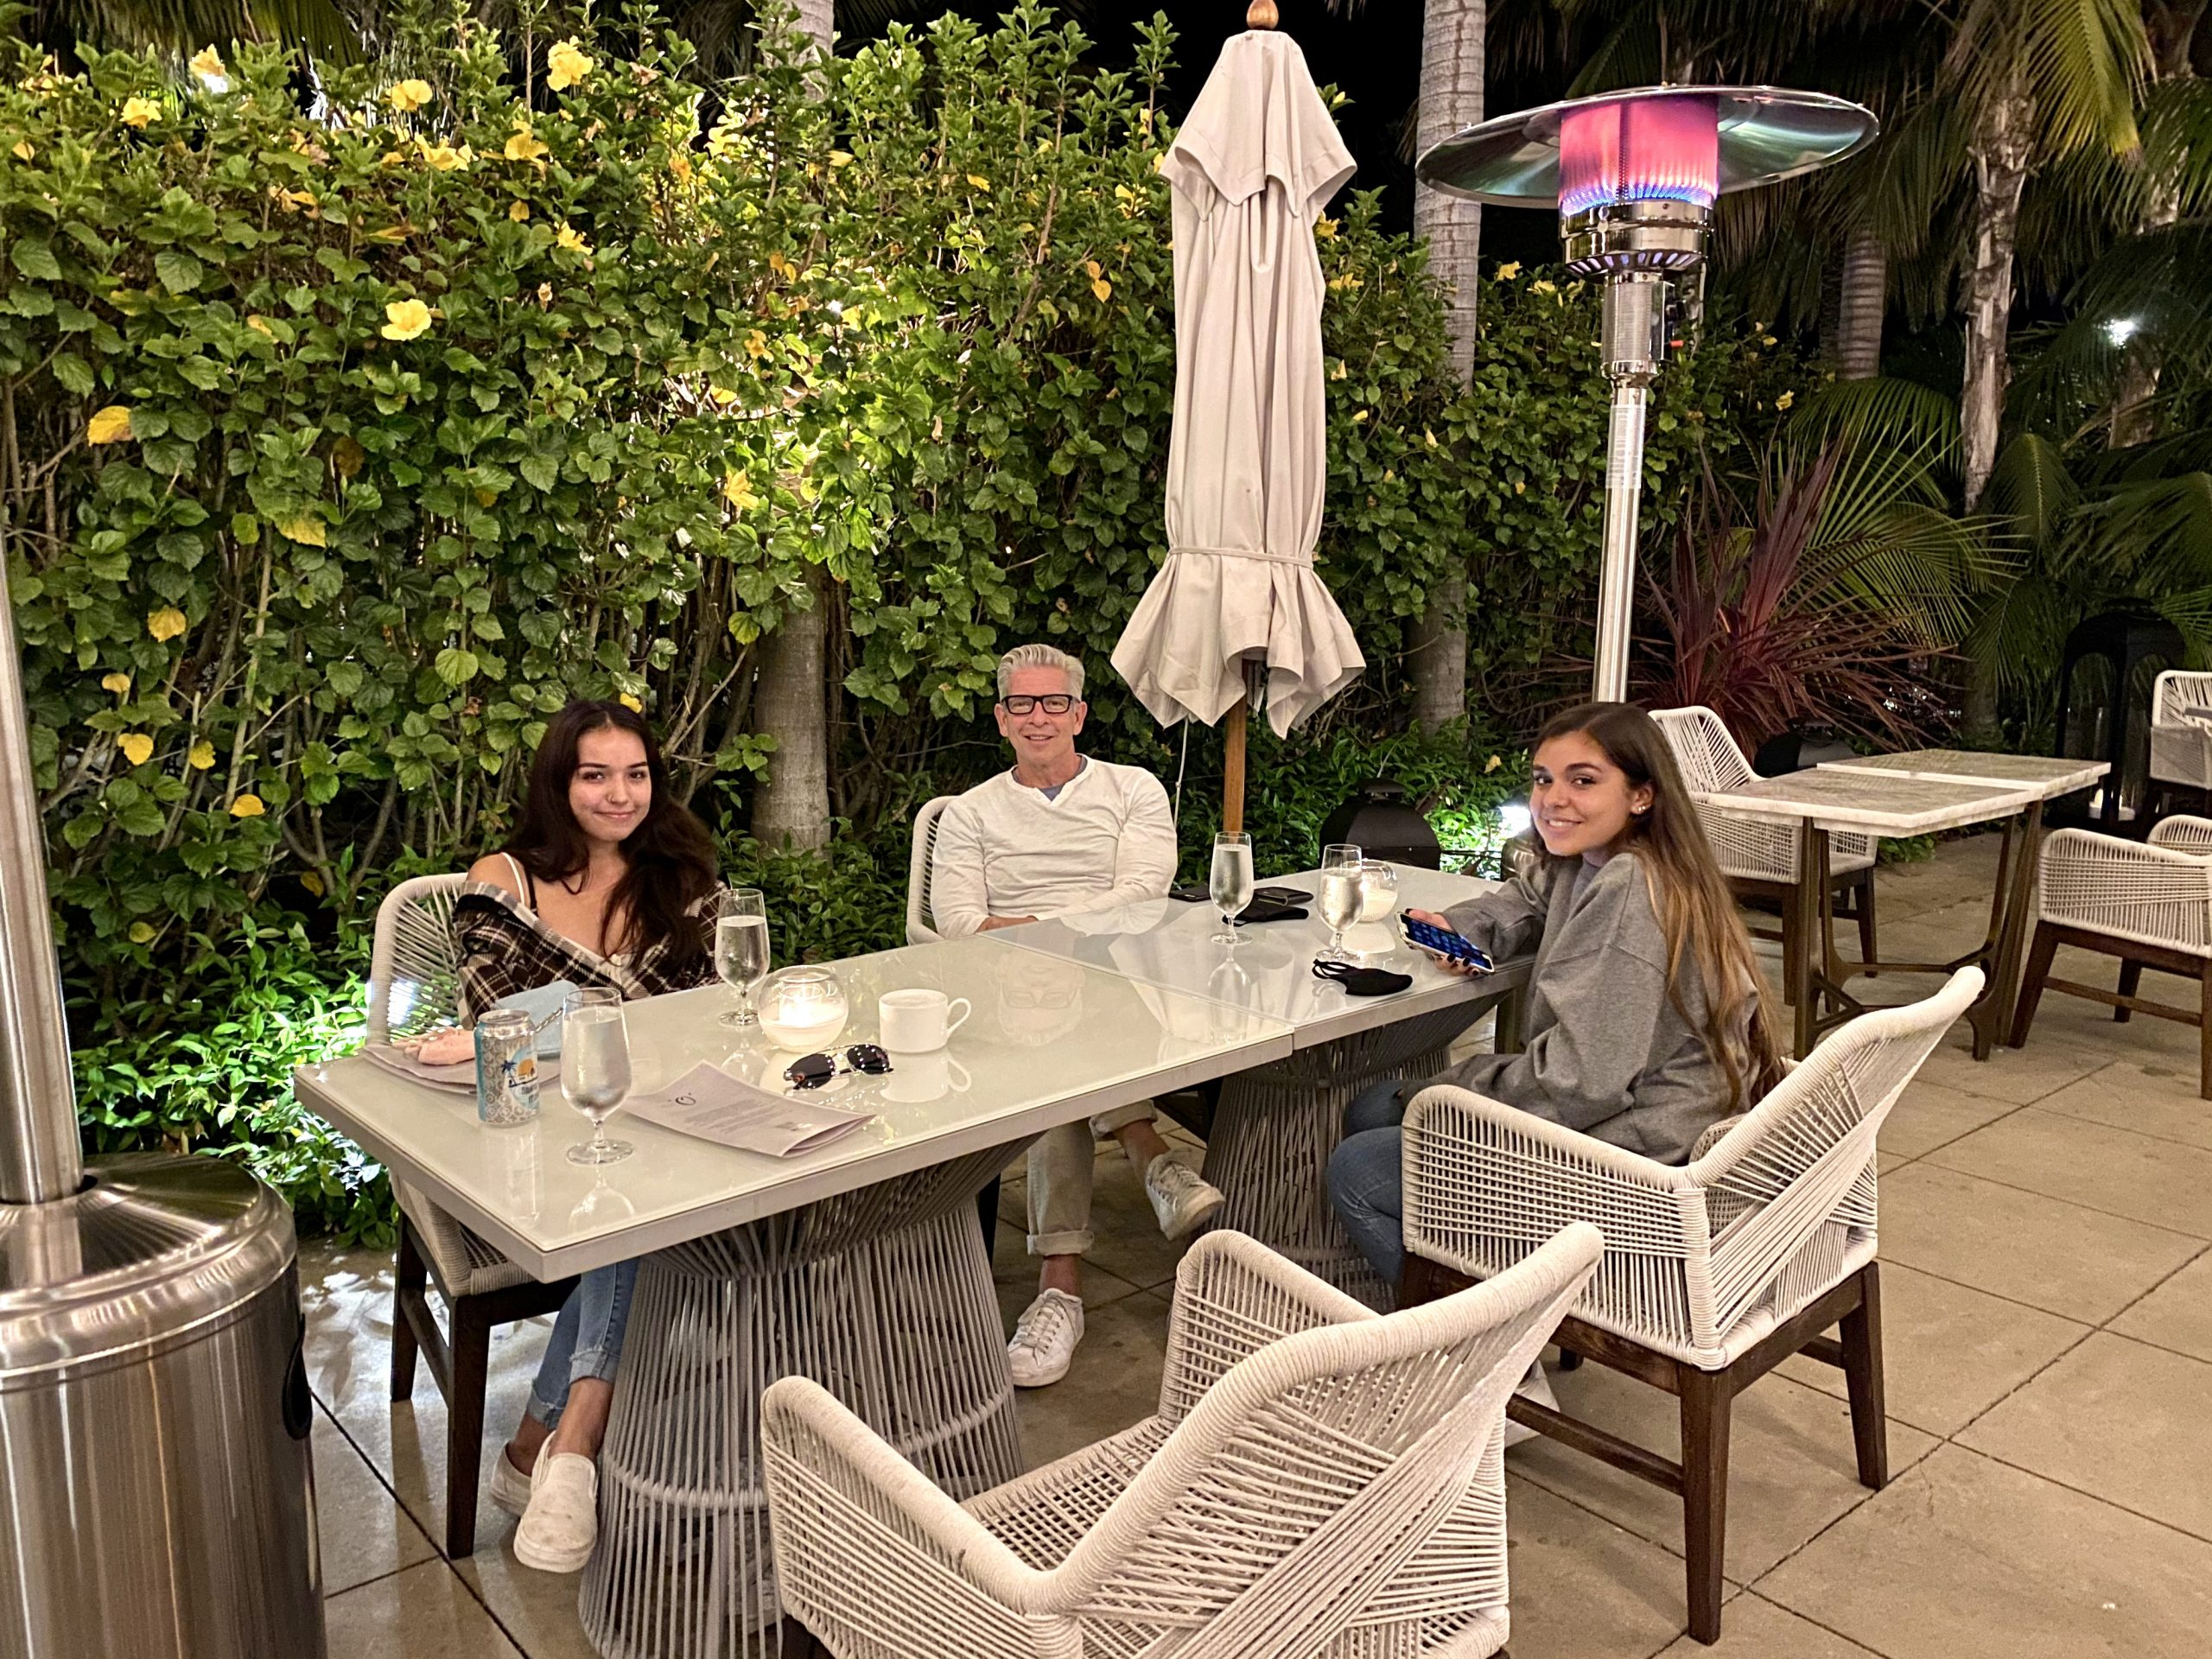 dining al fresco at the Ritz-Carlton Bacara Resort in Santa Barbara, CA